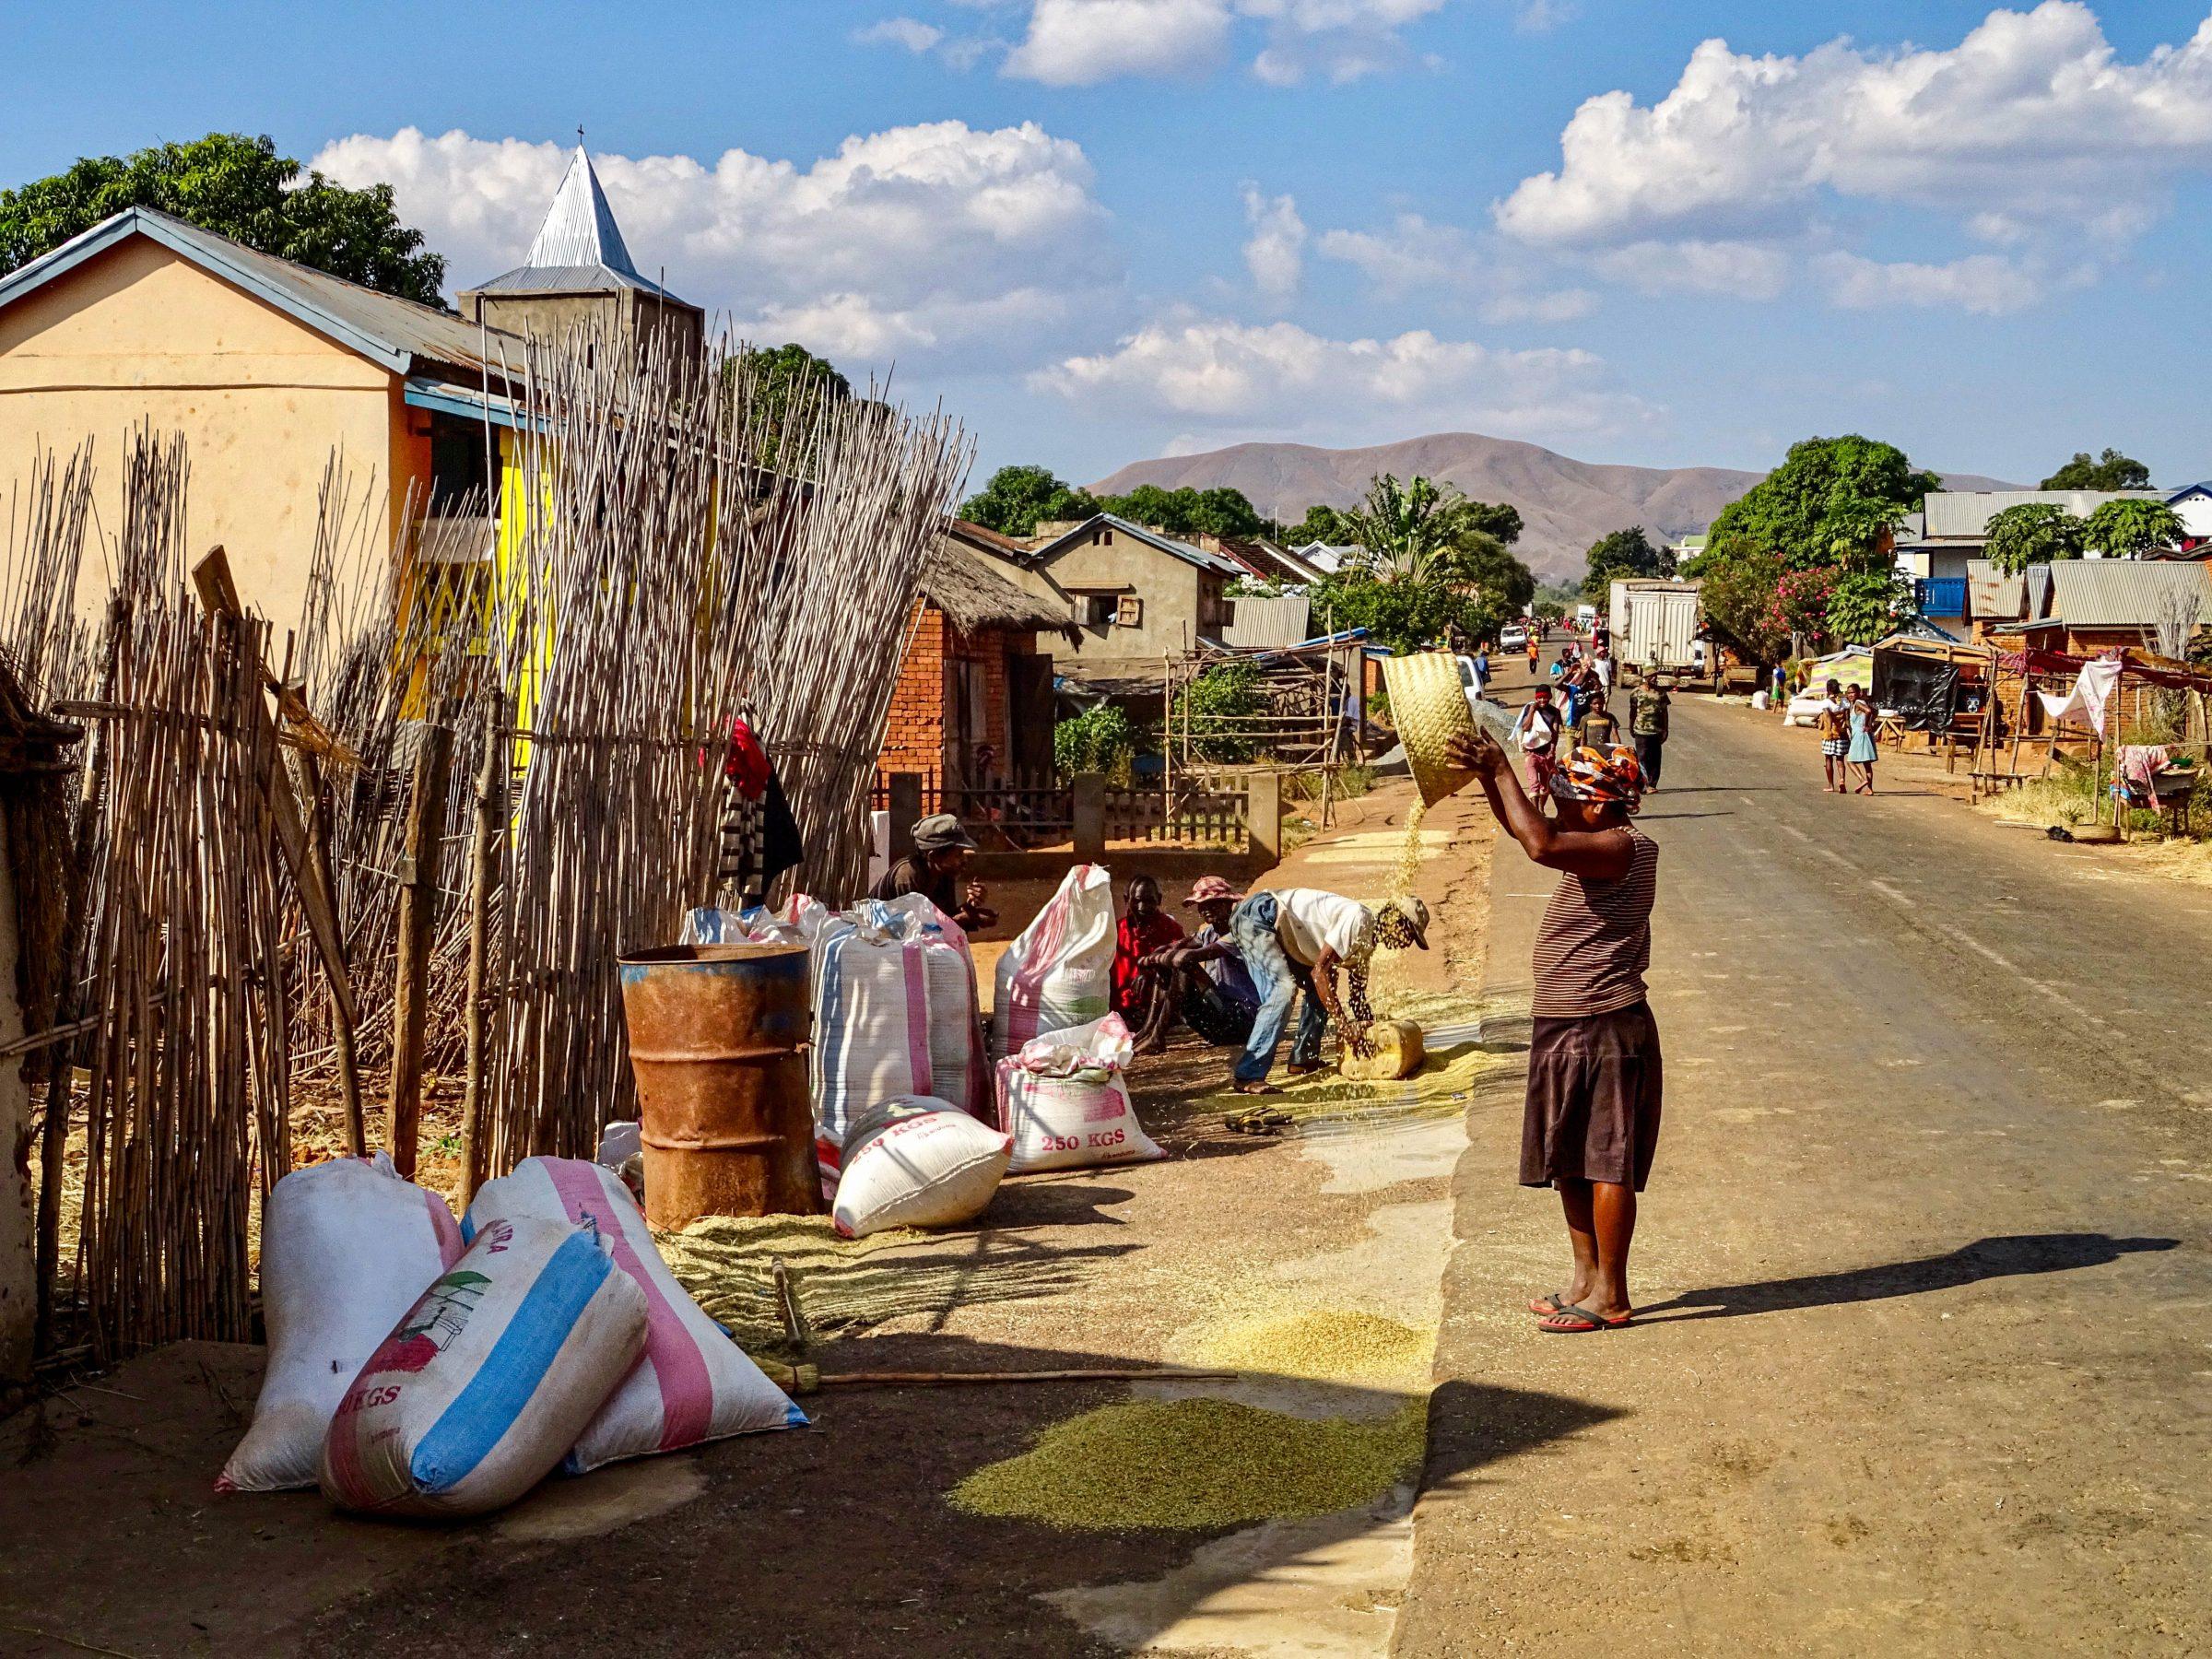 Karakteristieke taferelen in een Malagasy dorp